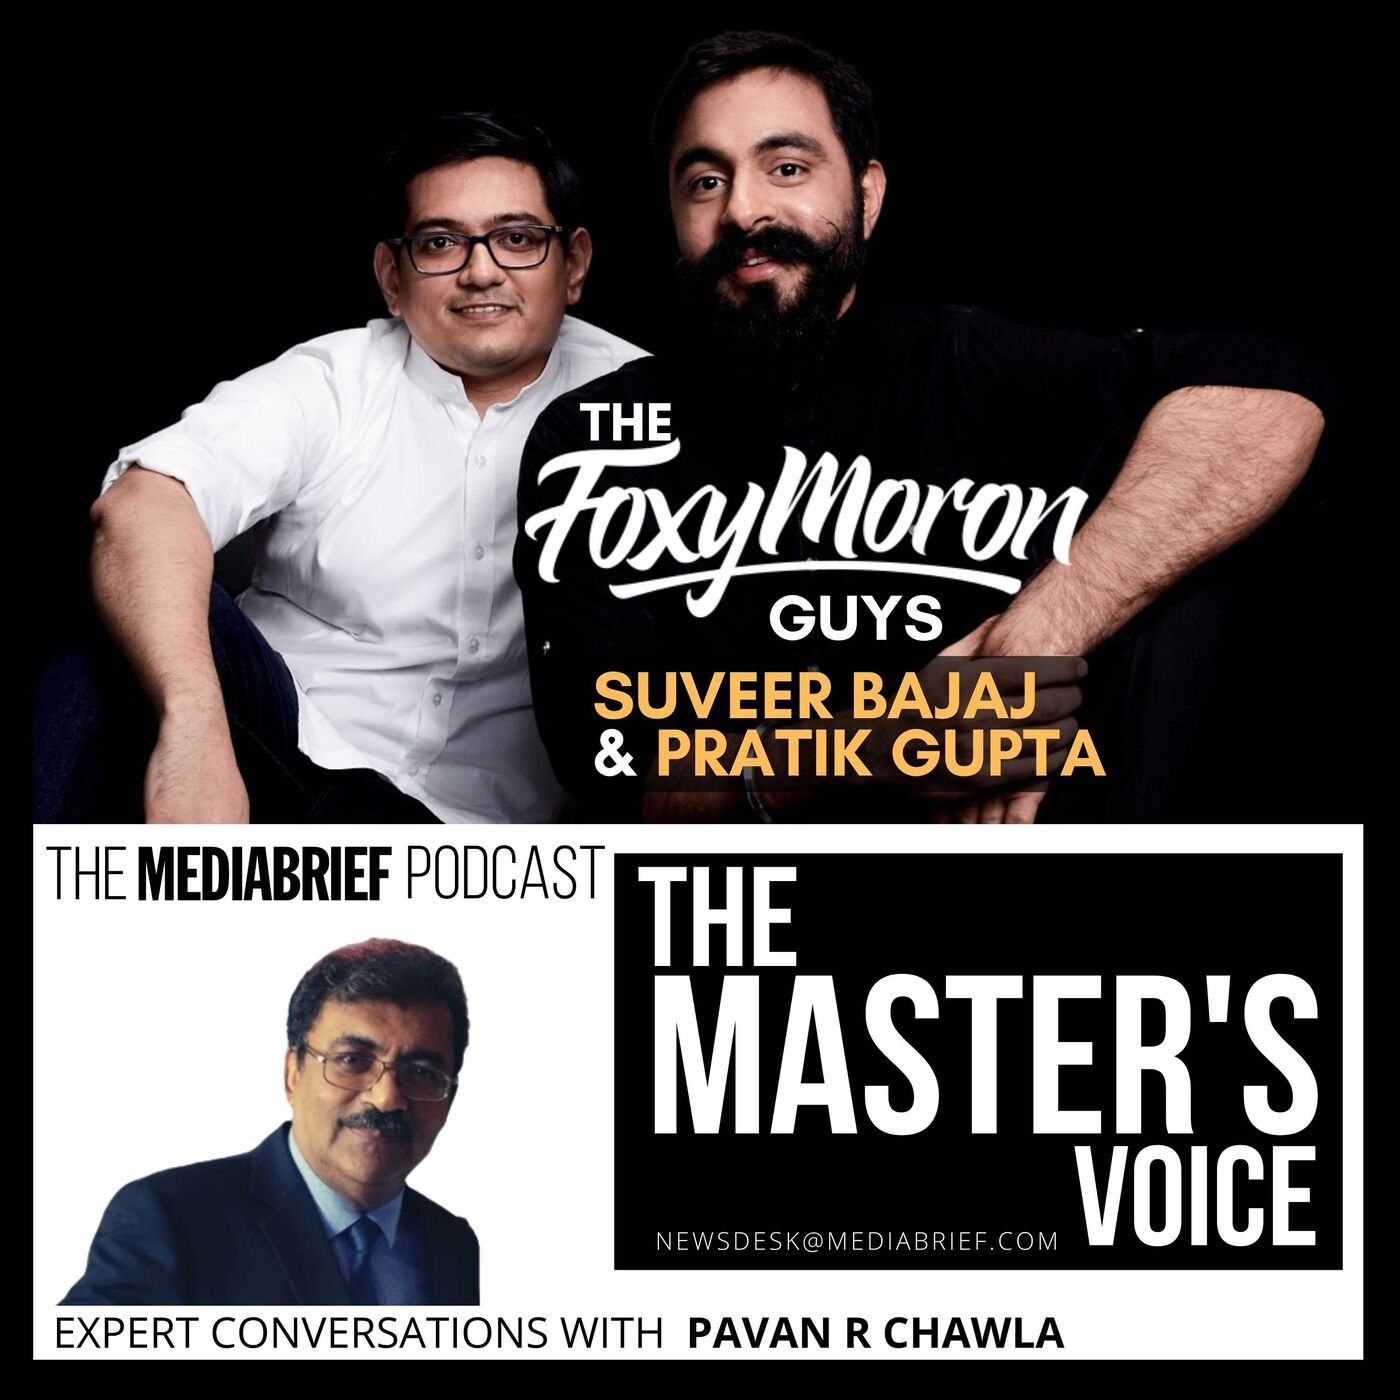 EXCLUSIVE: Suveer Bajaj and Pratik Gupta of Foxymoron, on The Master's Voice